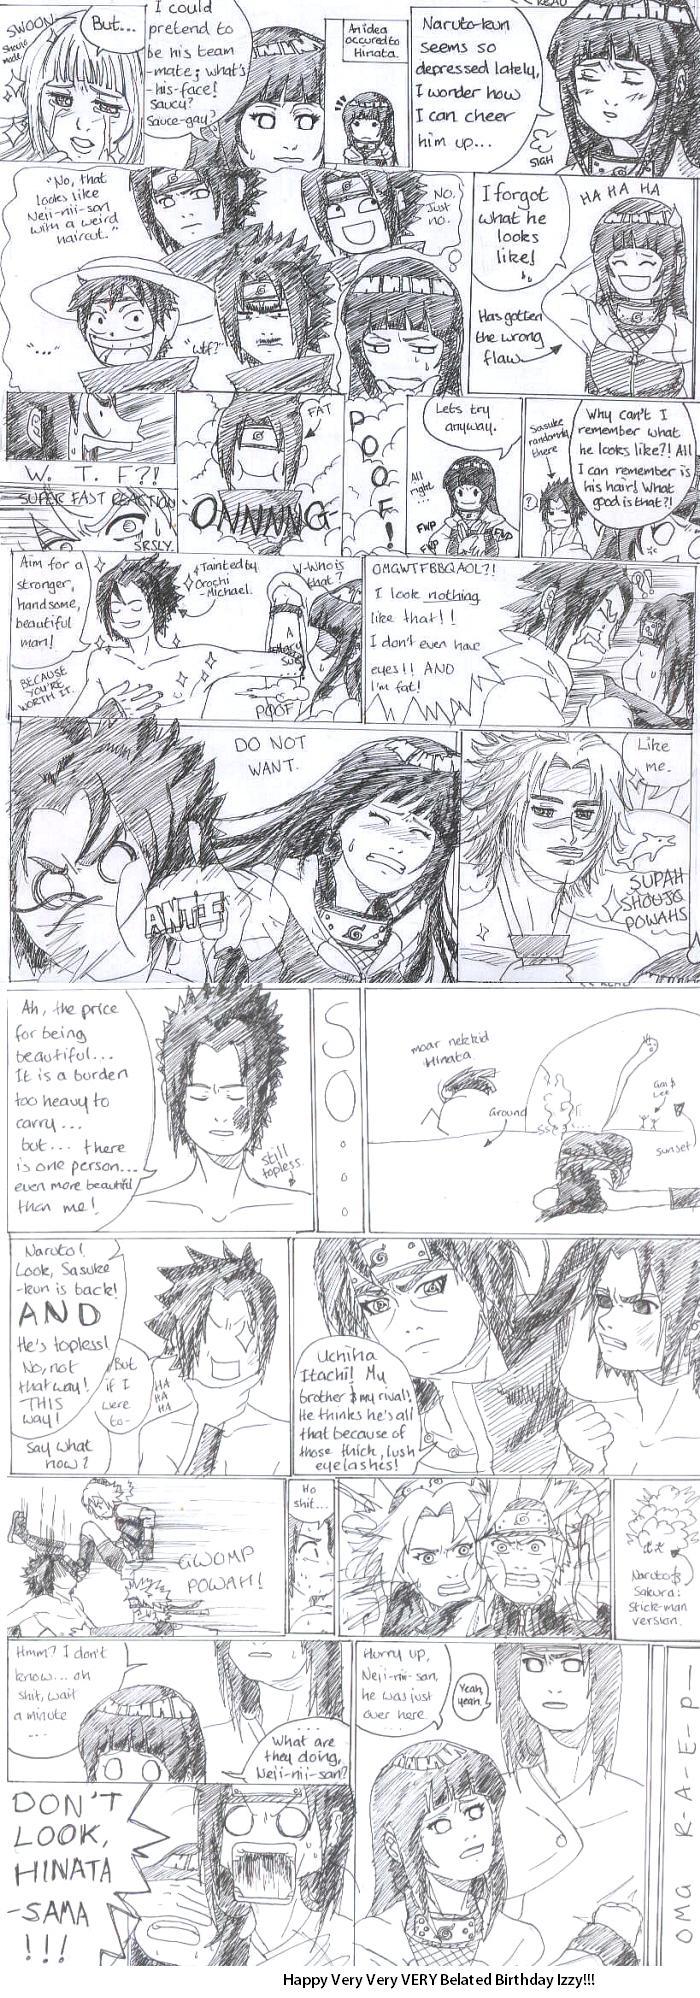 Hinata Horny throughout anti-sasuhina comic for izzytomato-box on deviantart